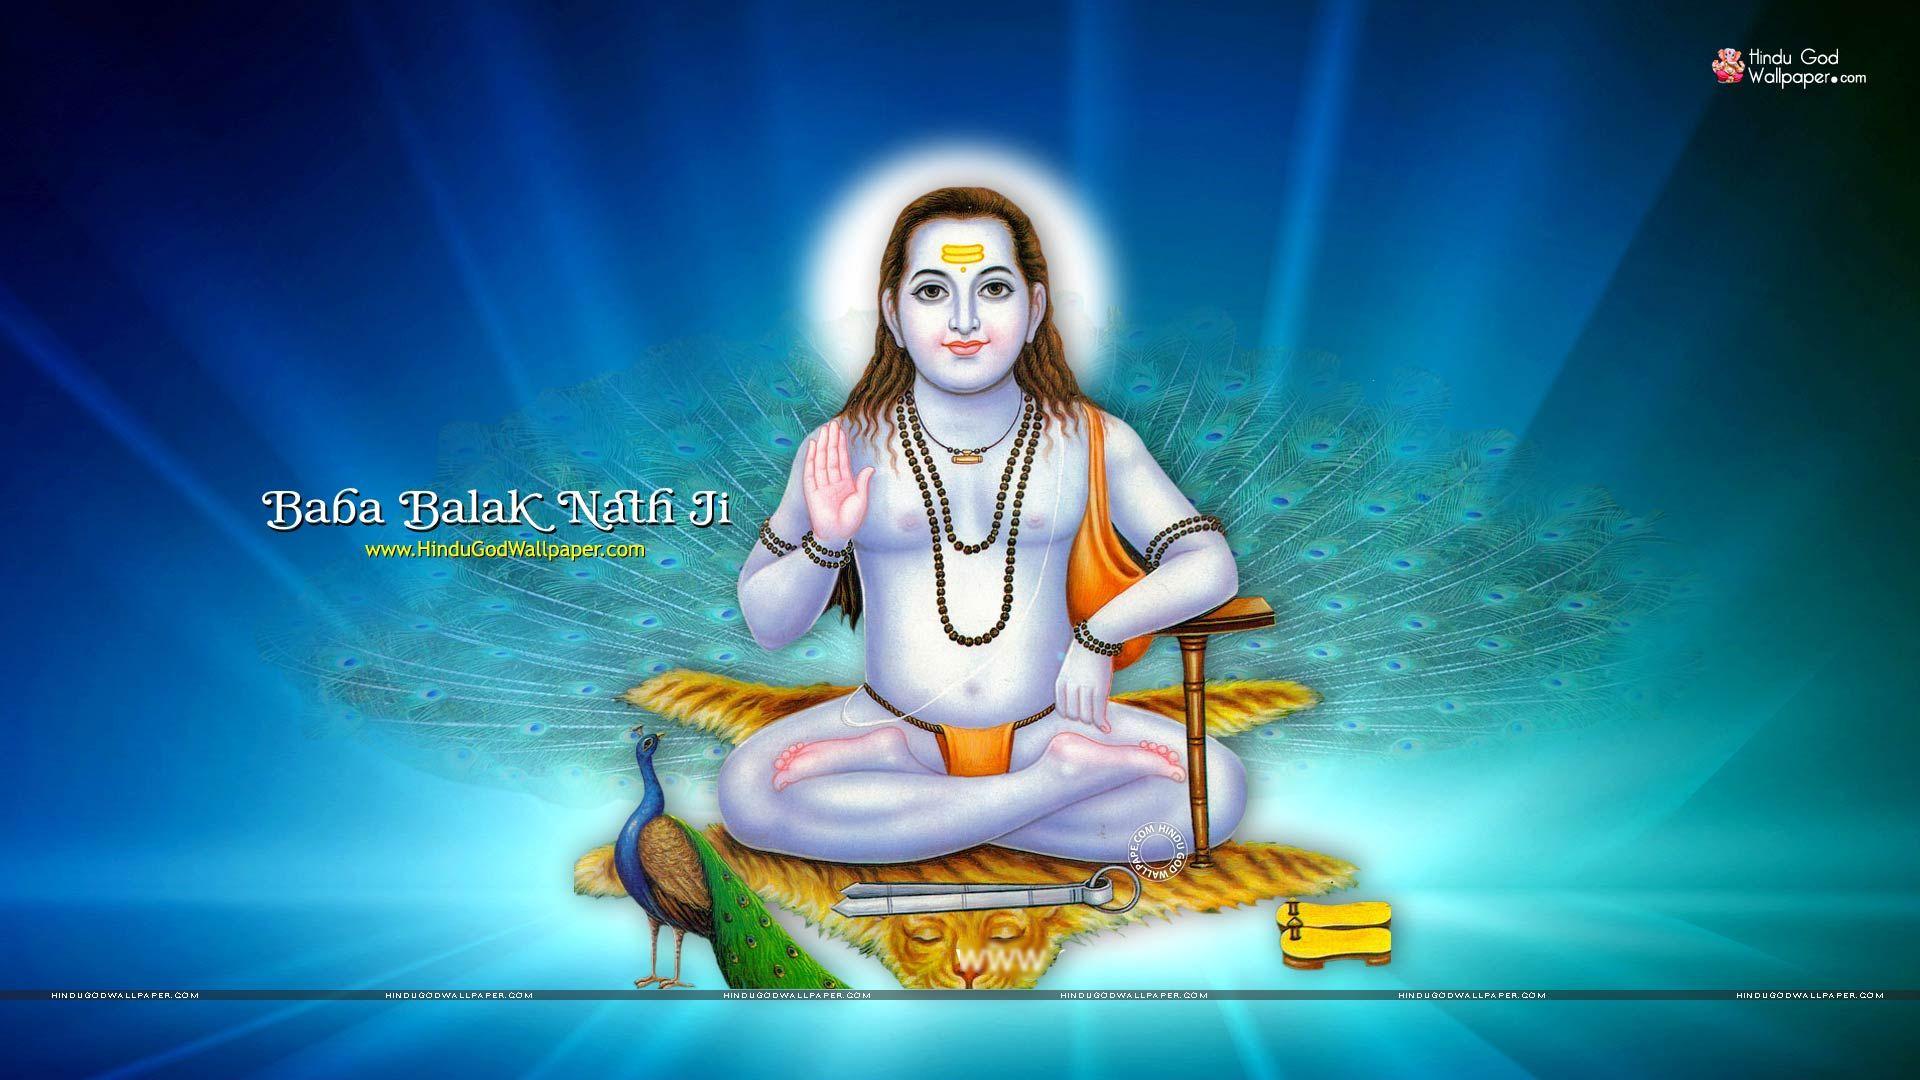 Baba Balak Nath Hd Wallpaper Wallpaper Free Download Beautiful Wallpapers Hd Wallpaper